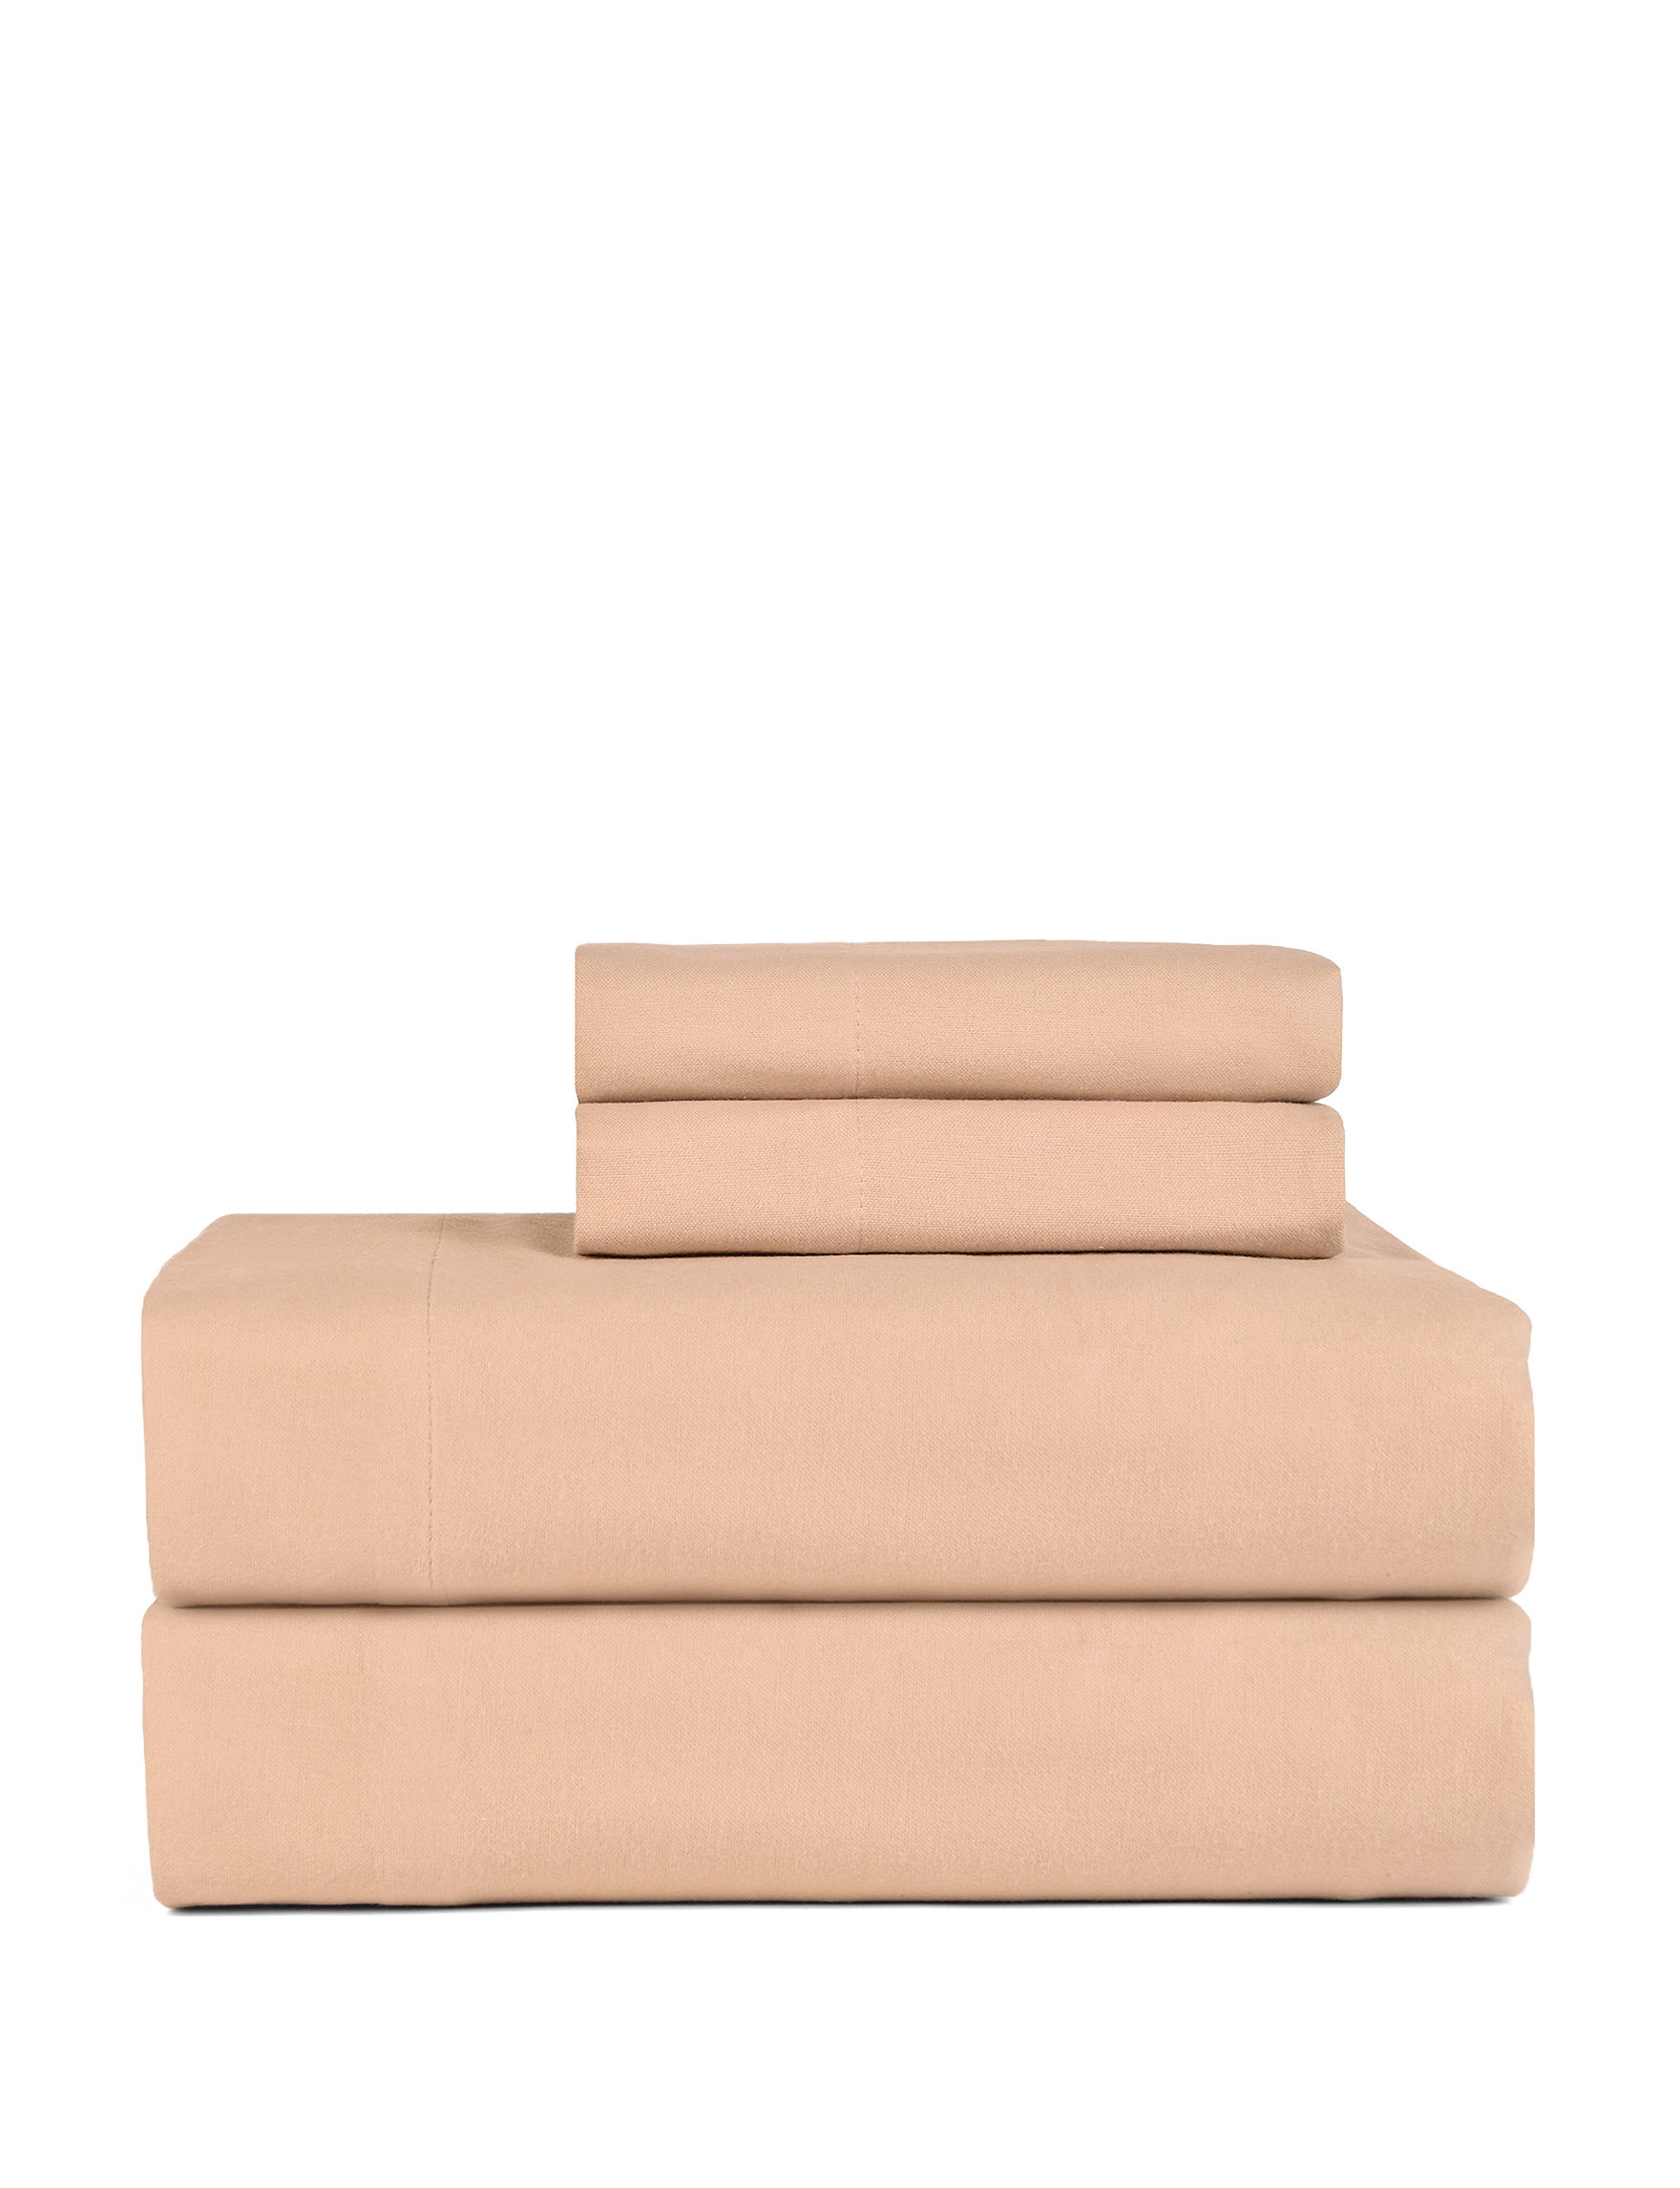 Celeste Home Sand Sheets & Pillowcases